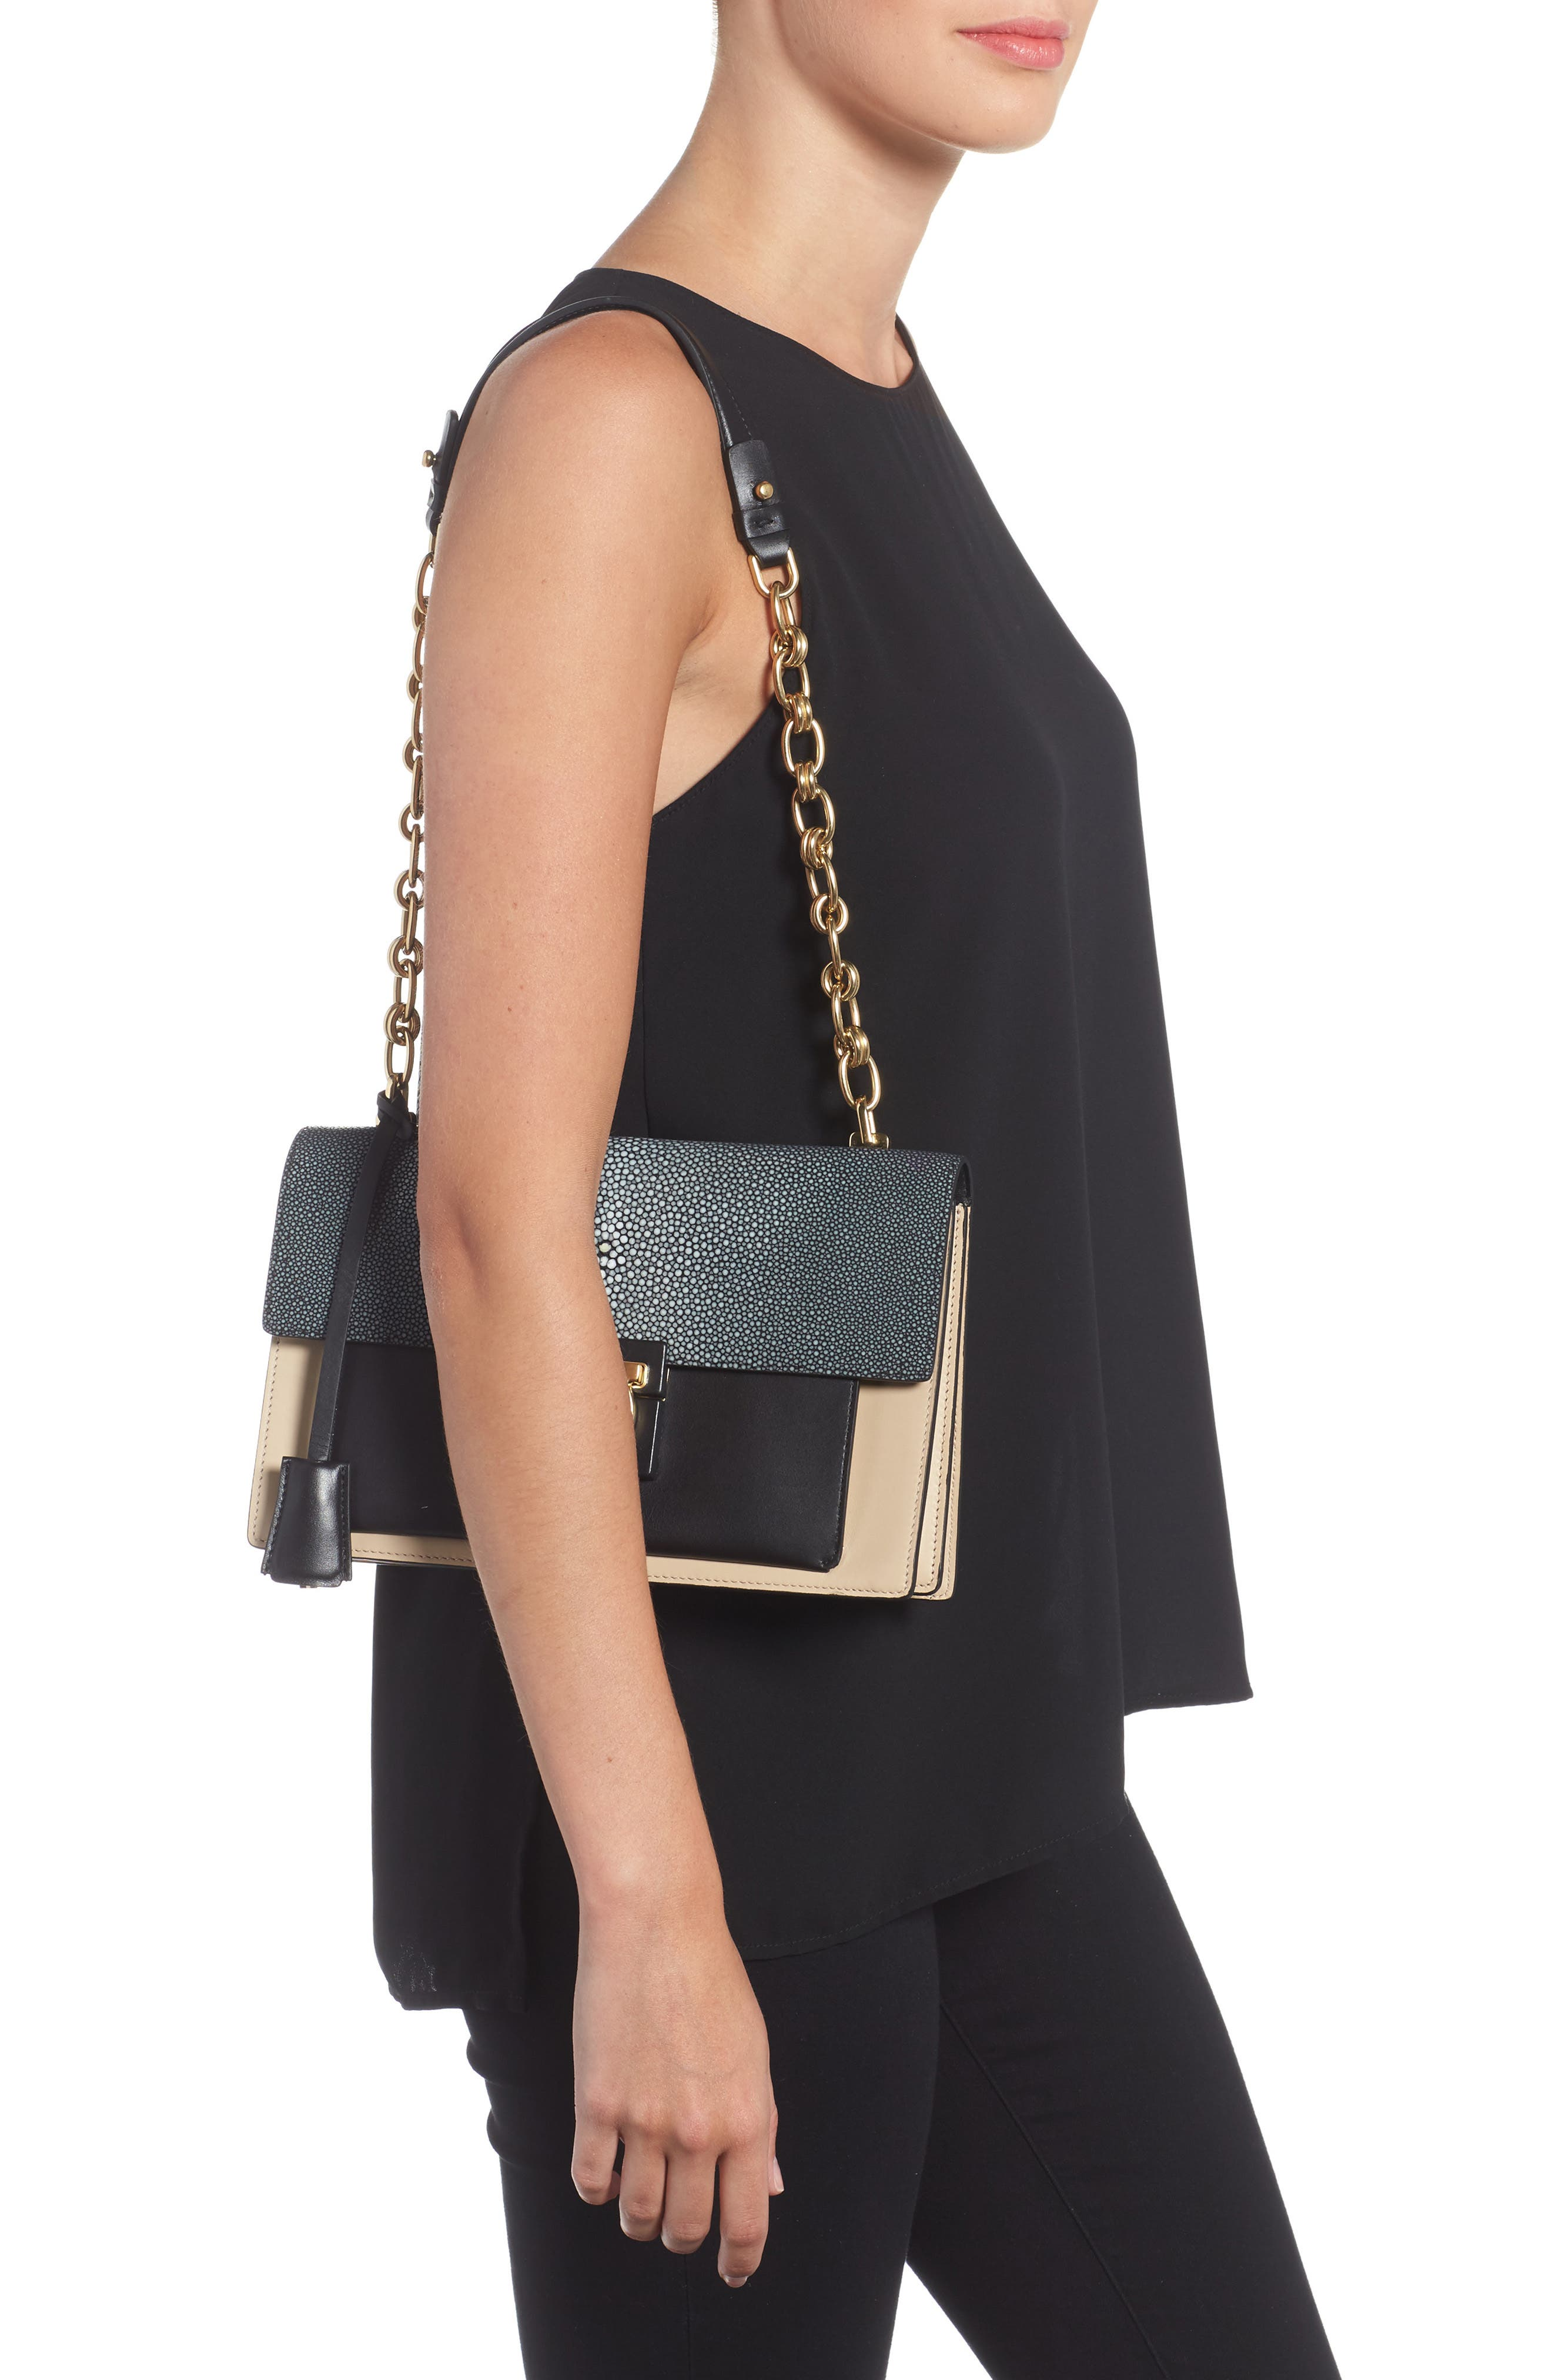 SALVATORE FERRAGAMO,                             Stingray Leather Shoulder Bag,                             Alternate thumbnail 2, color,                             974